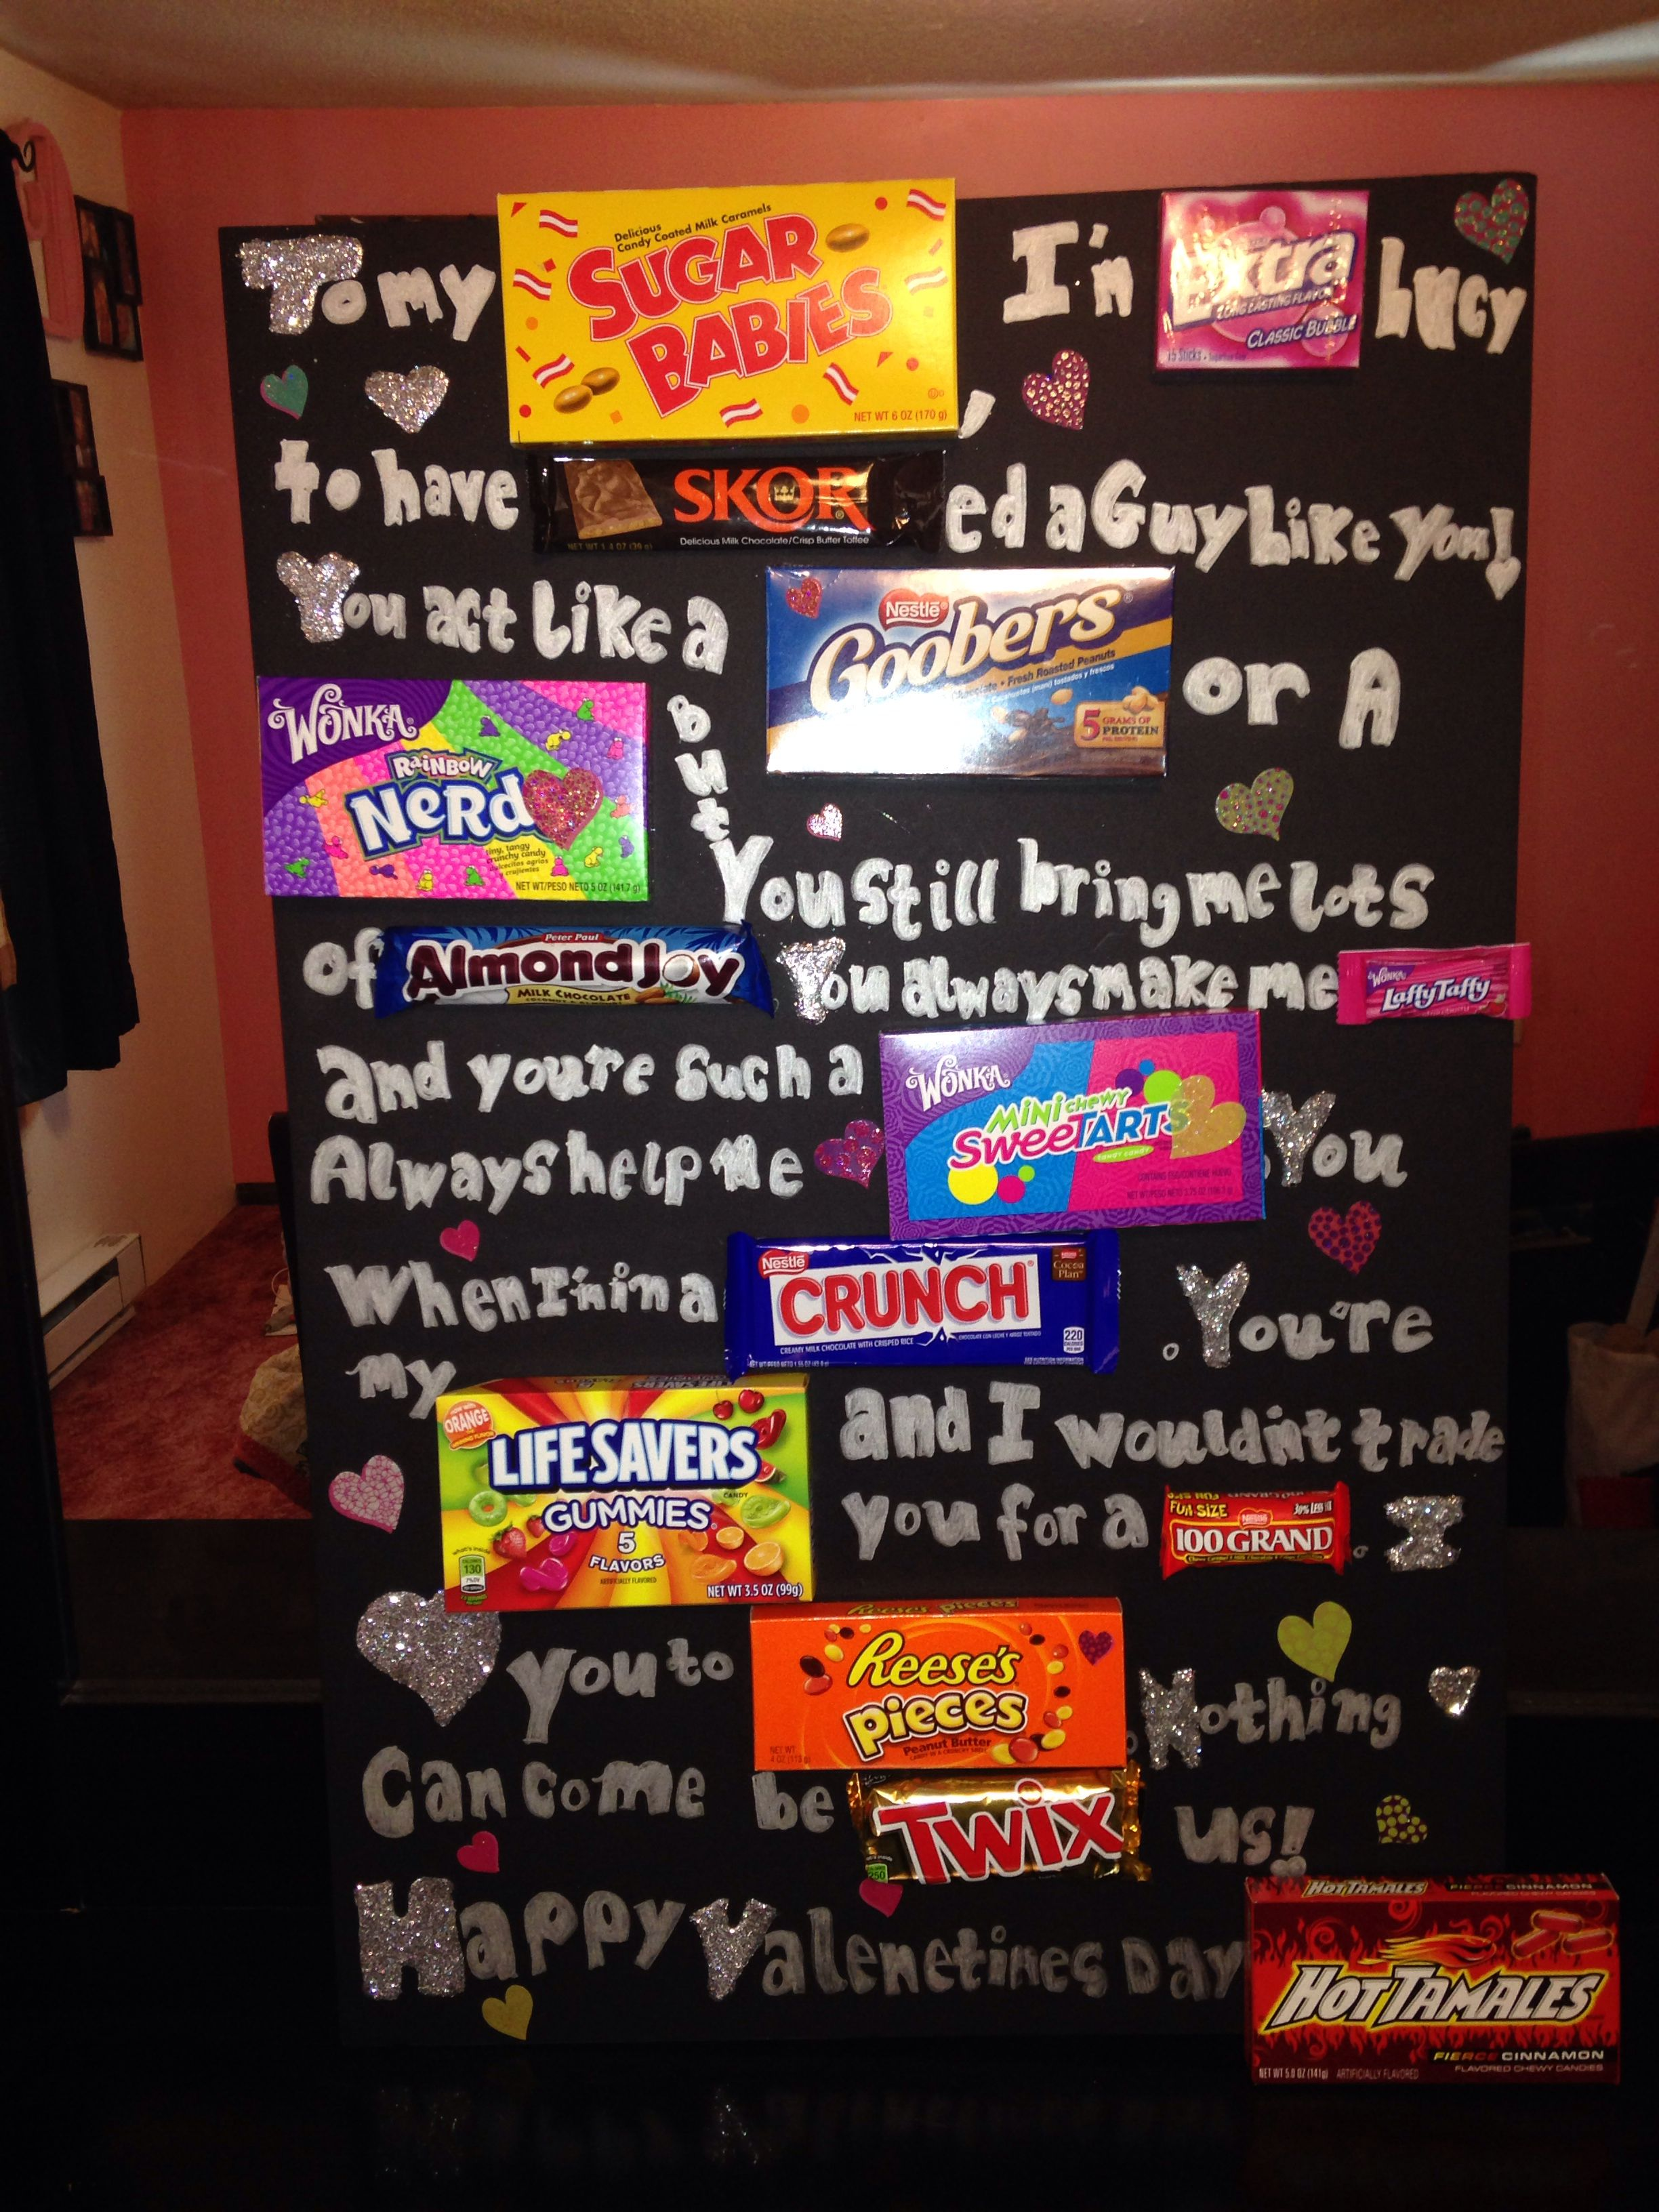 Valentines Day Candy Board For Your Boyfriend Gettin Crafty